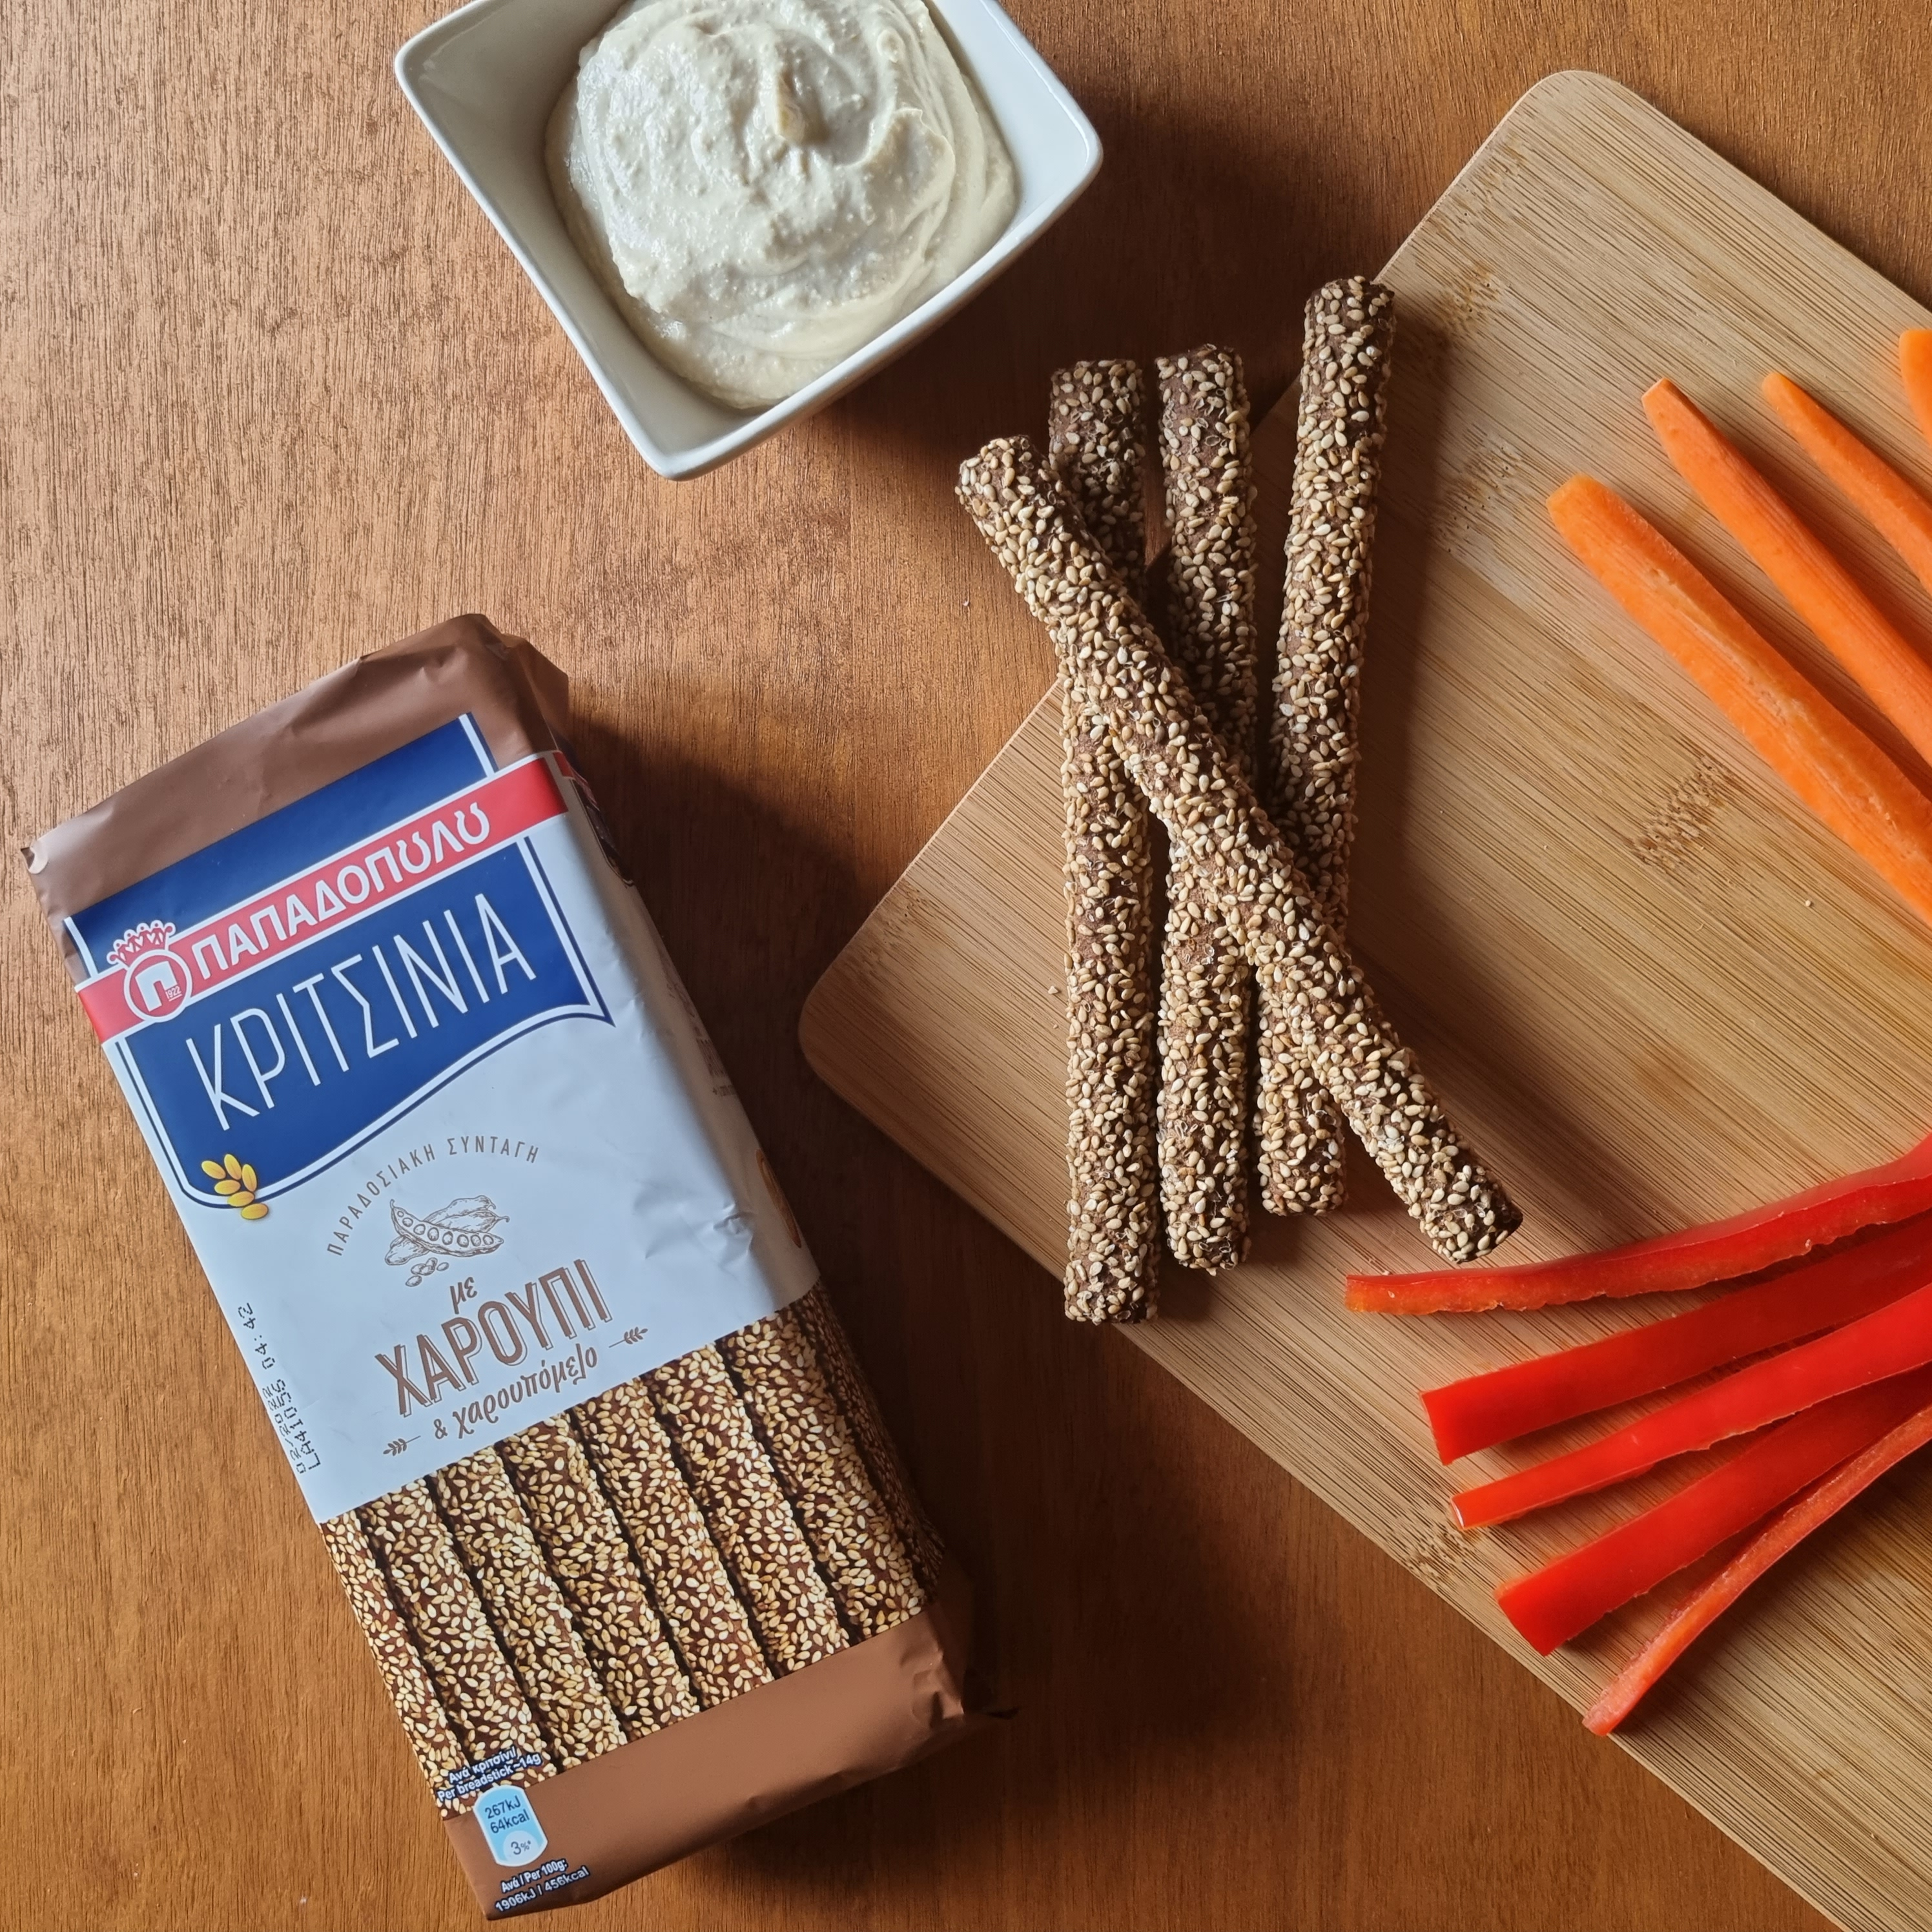 Image for Κριτσίνια με χαρούπι με χούμους και φρέσκα λαχανικά. Ωραία ιδέα!